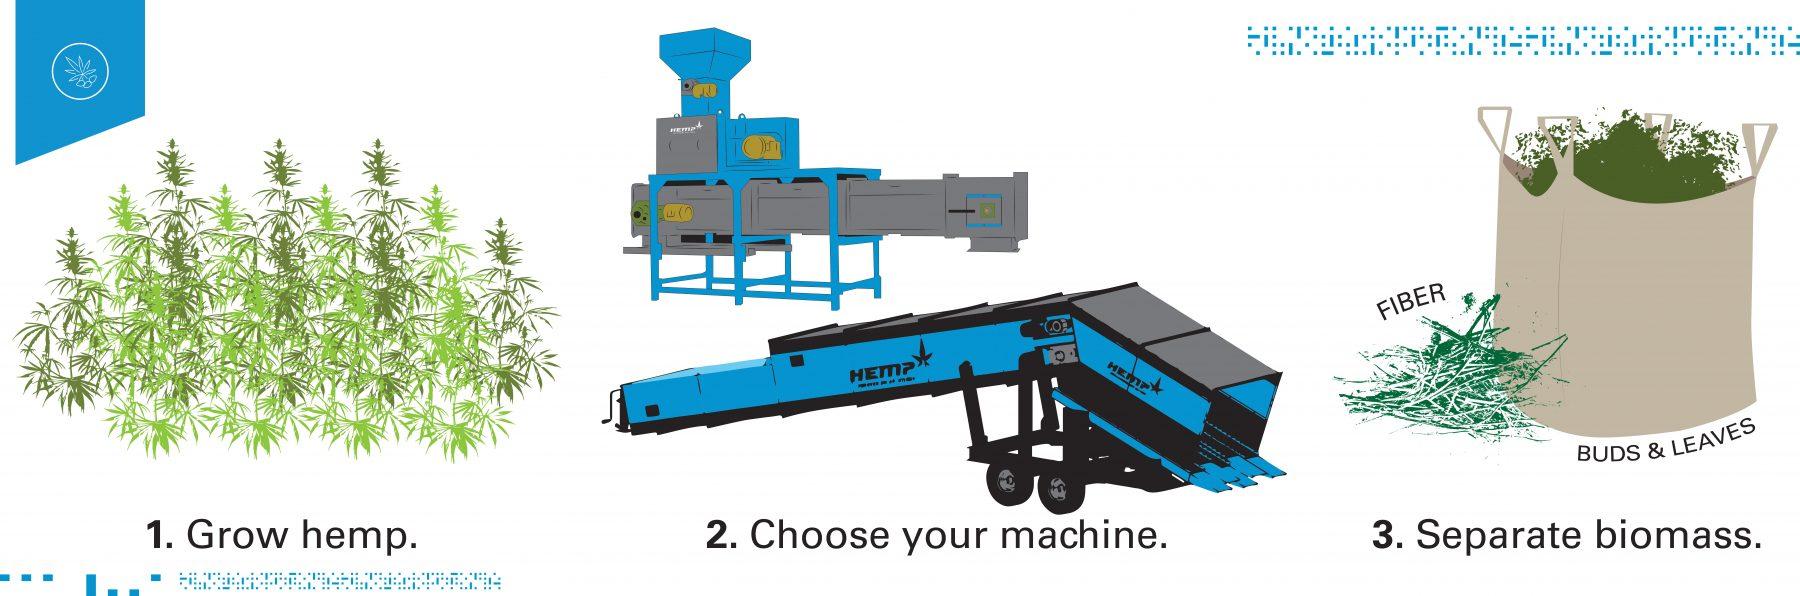 Choose Your Machine